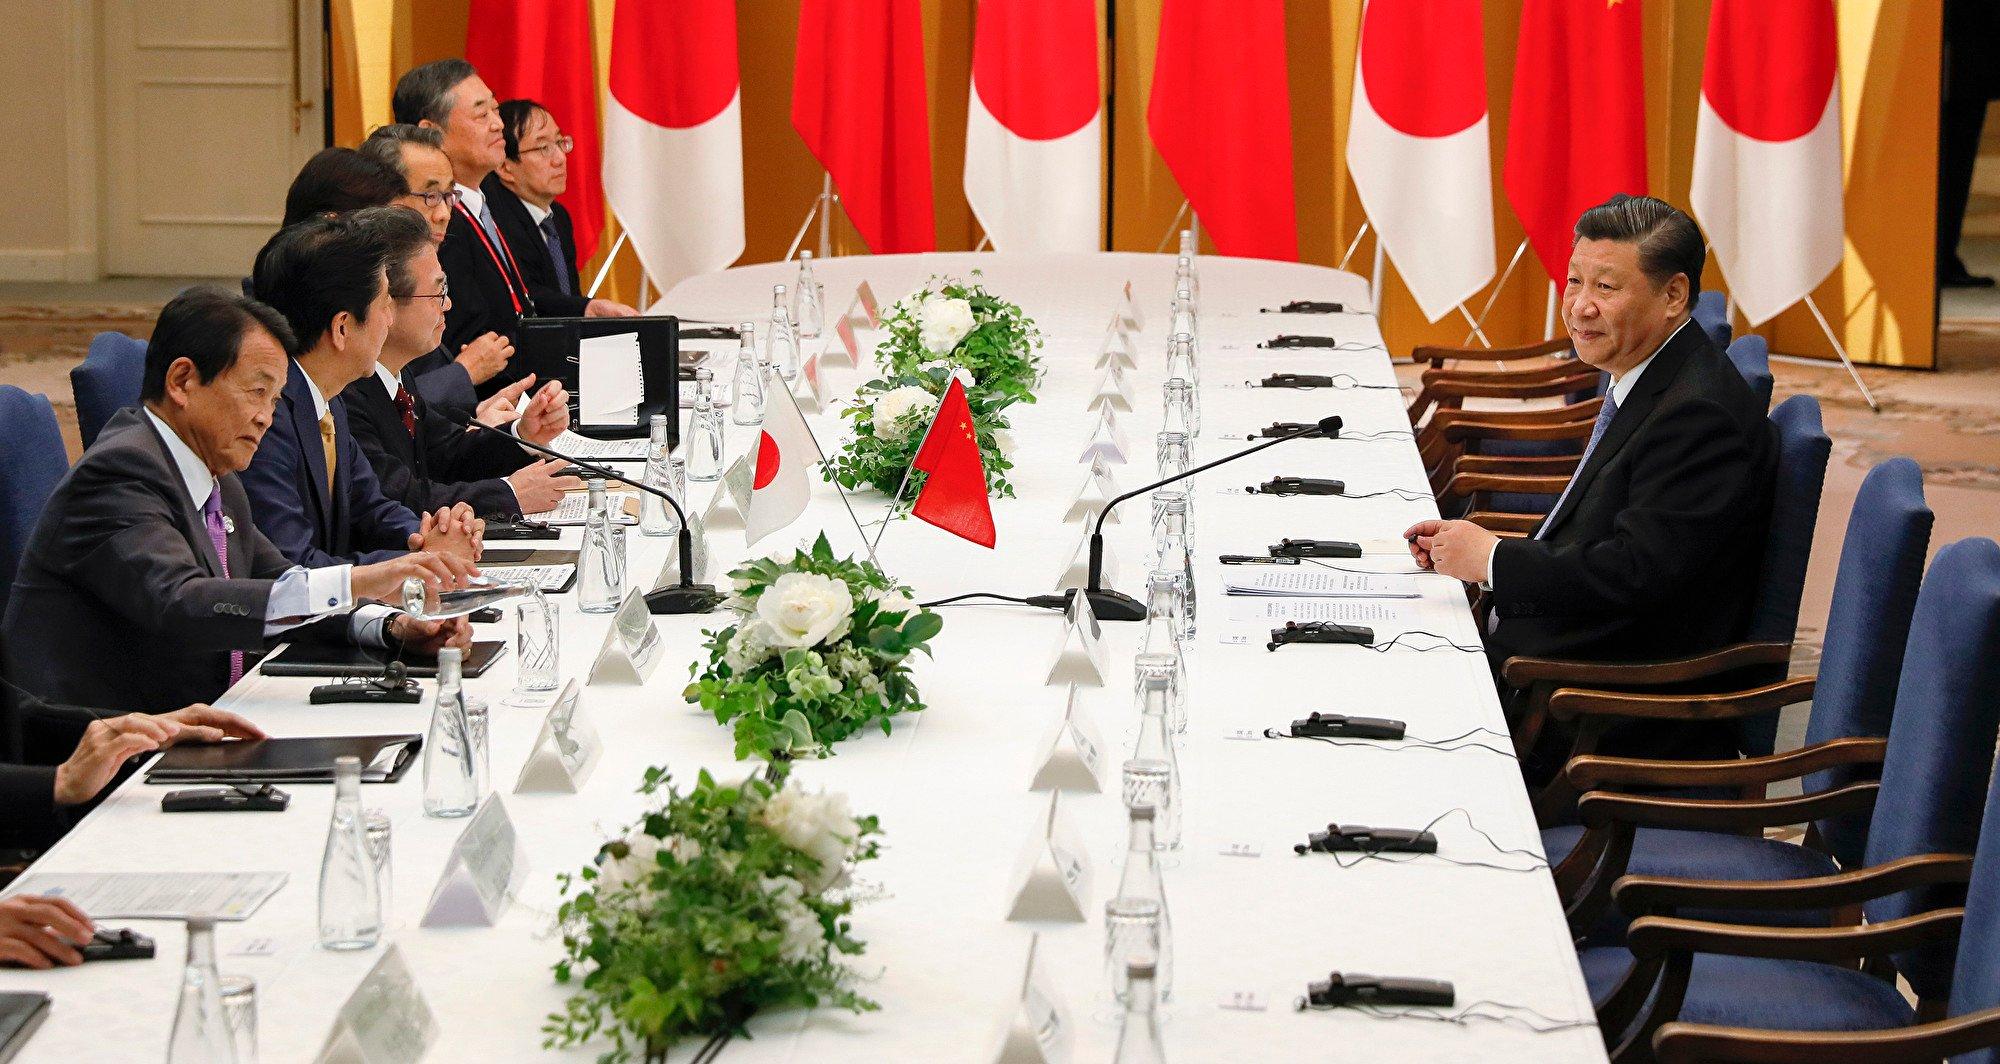 習近平與安倍晉三27日晚會面,「孤獨戰士」場面再現。 (Kimimasa MAYAMA / various sources / AFP)